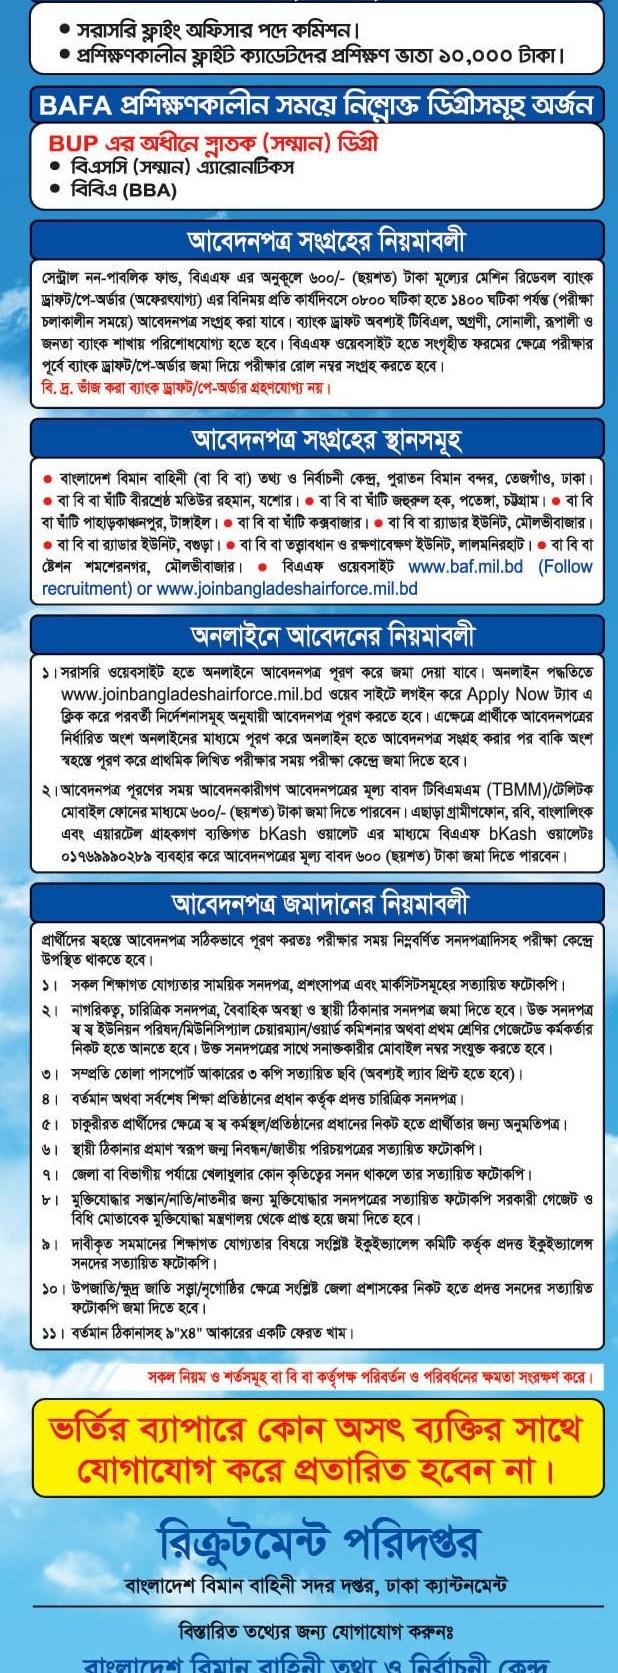 Air Force job circular 2018 Govt Jobs in Bangladesh1